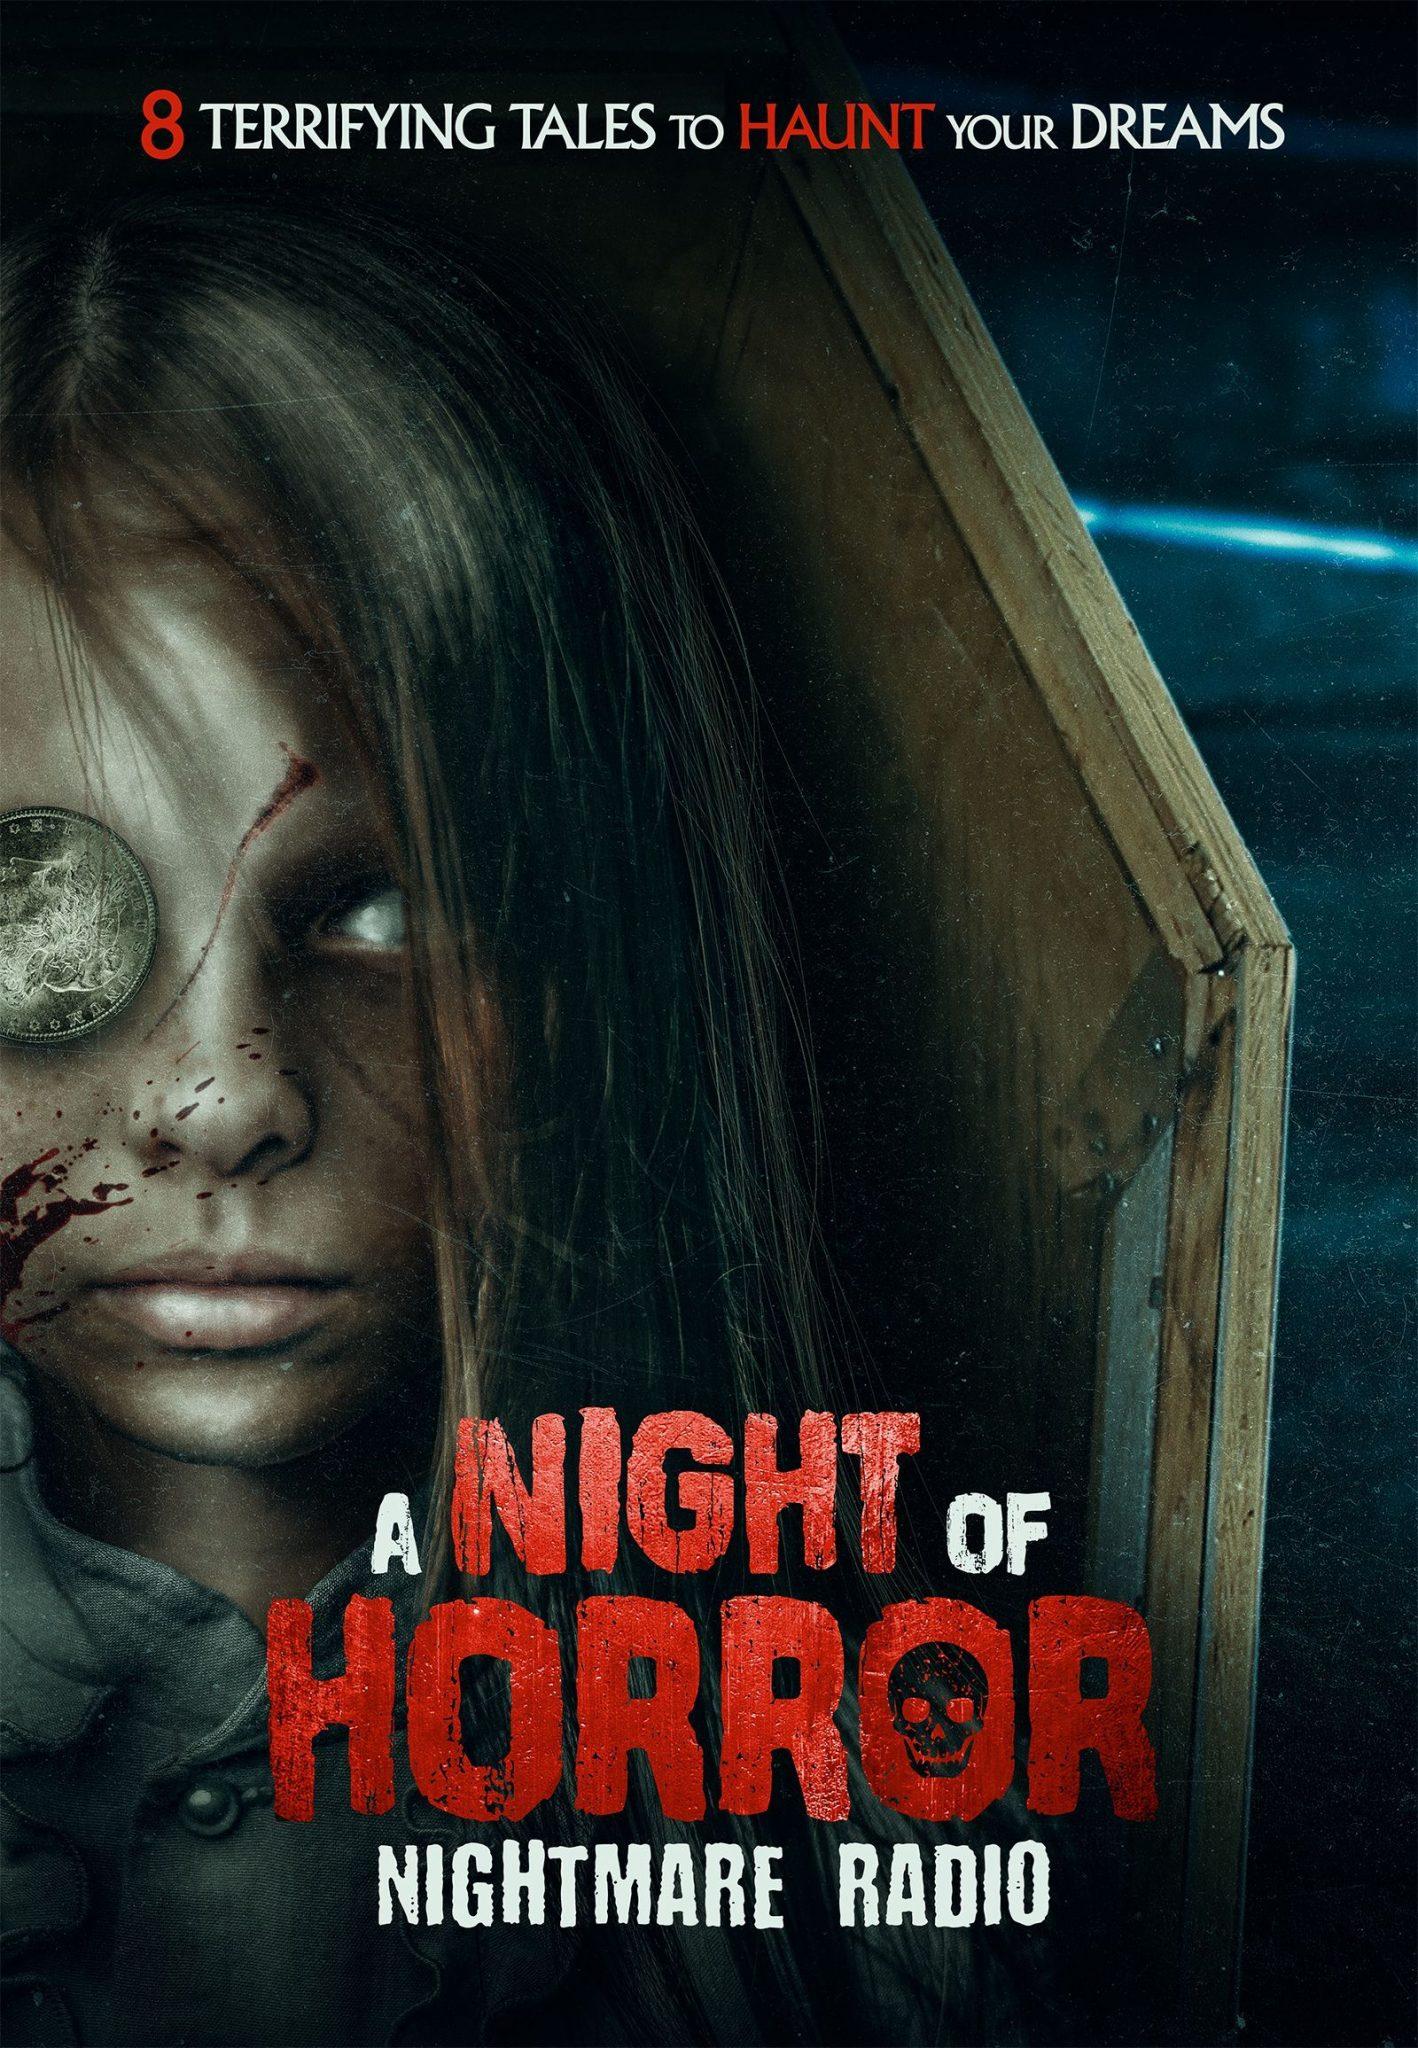 Night of horror nightmare radio affiche